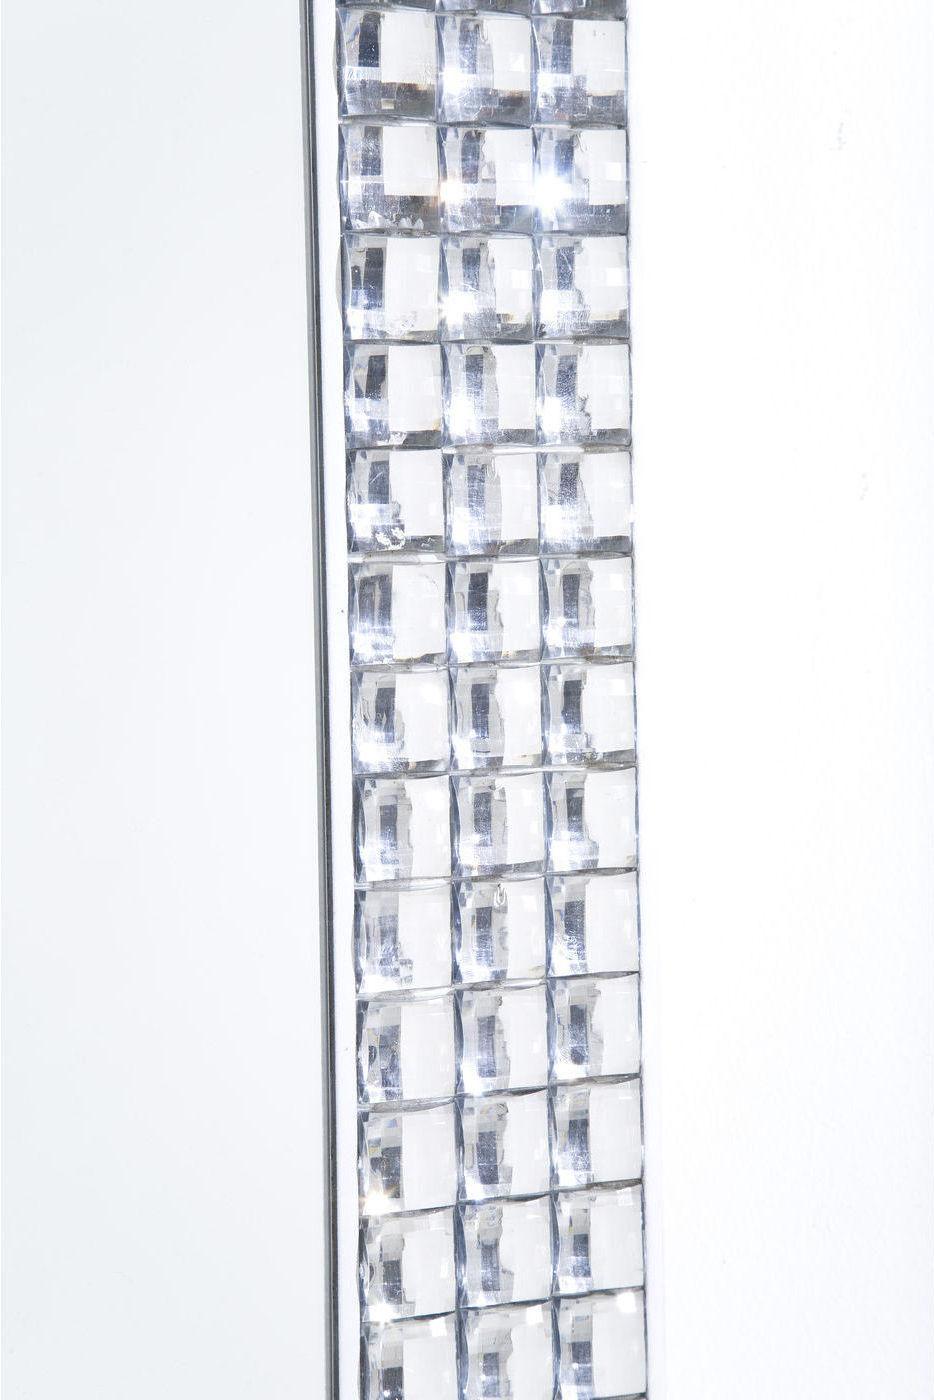 spiegel crystals 180x80 kare design kaufen. Black Bedroom Furniture Sets. Home Design Ideas